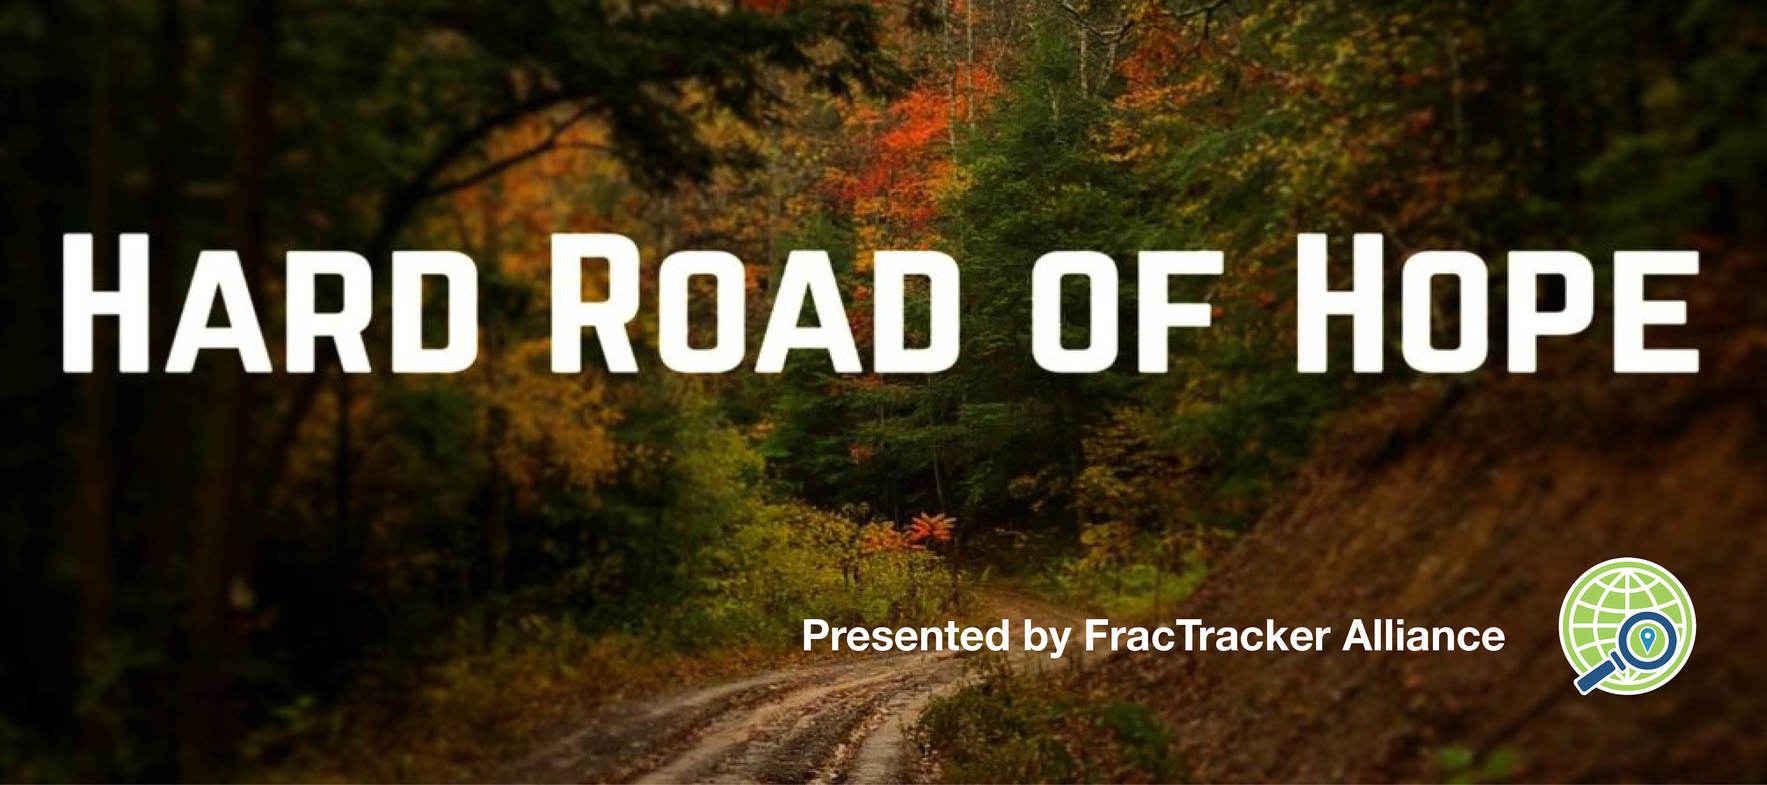 Hard Road of Hope image